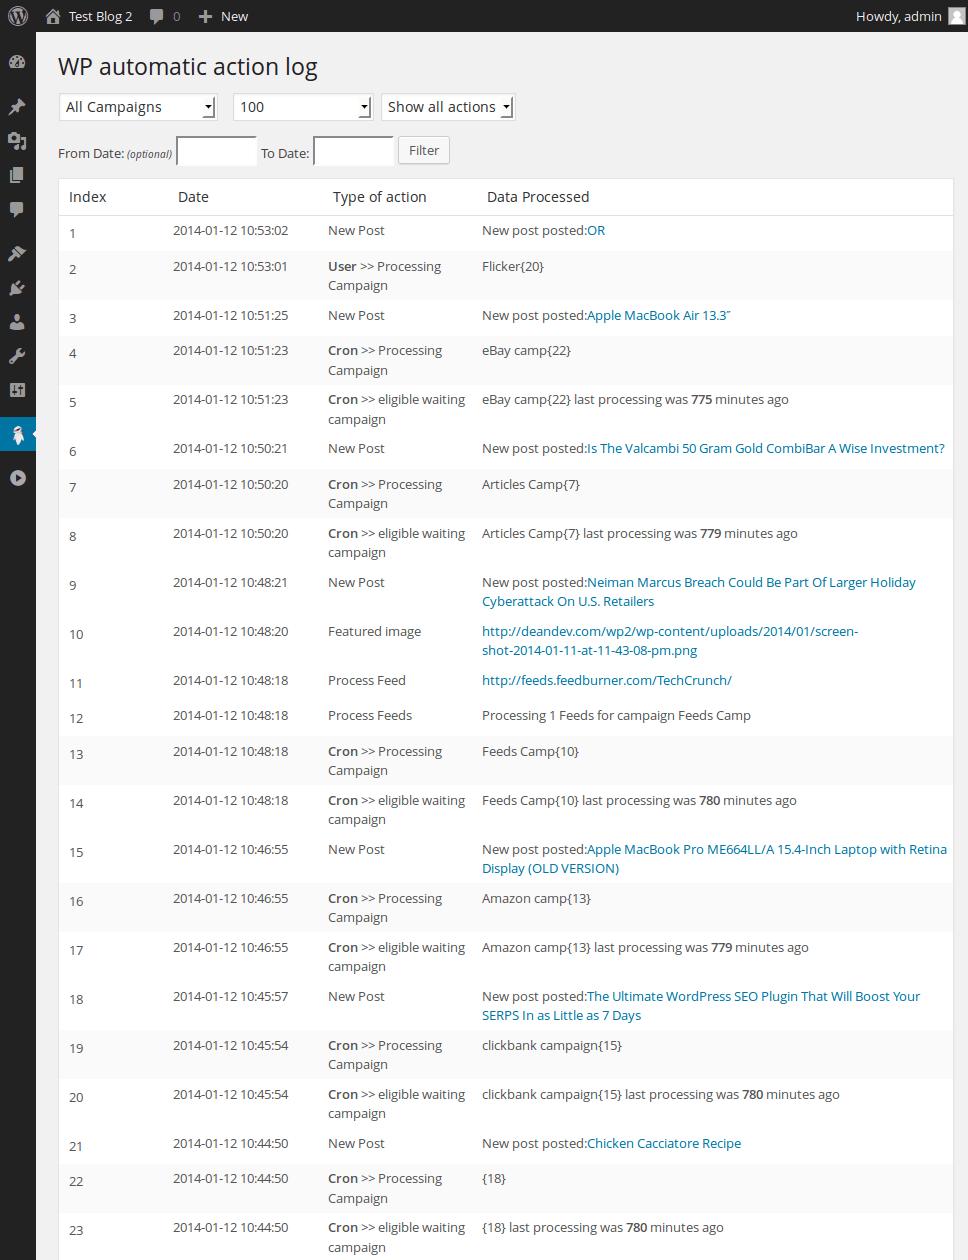 WP Automatic action log Screenshot